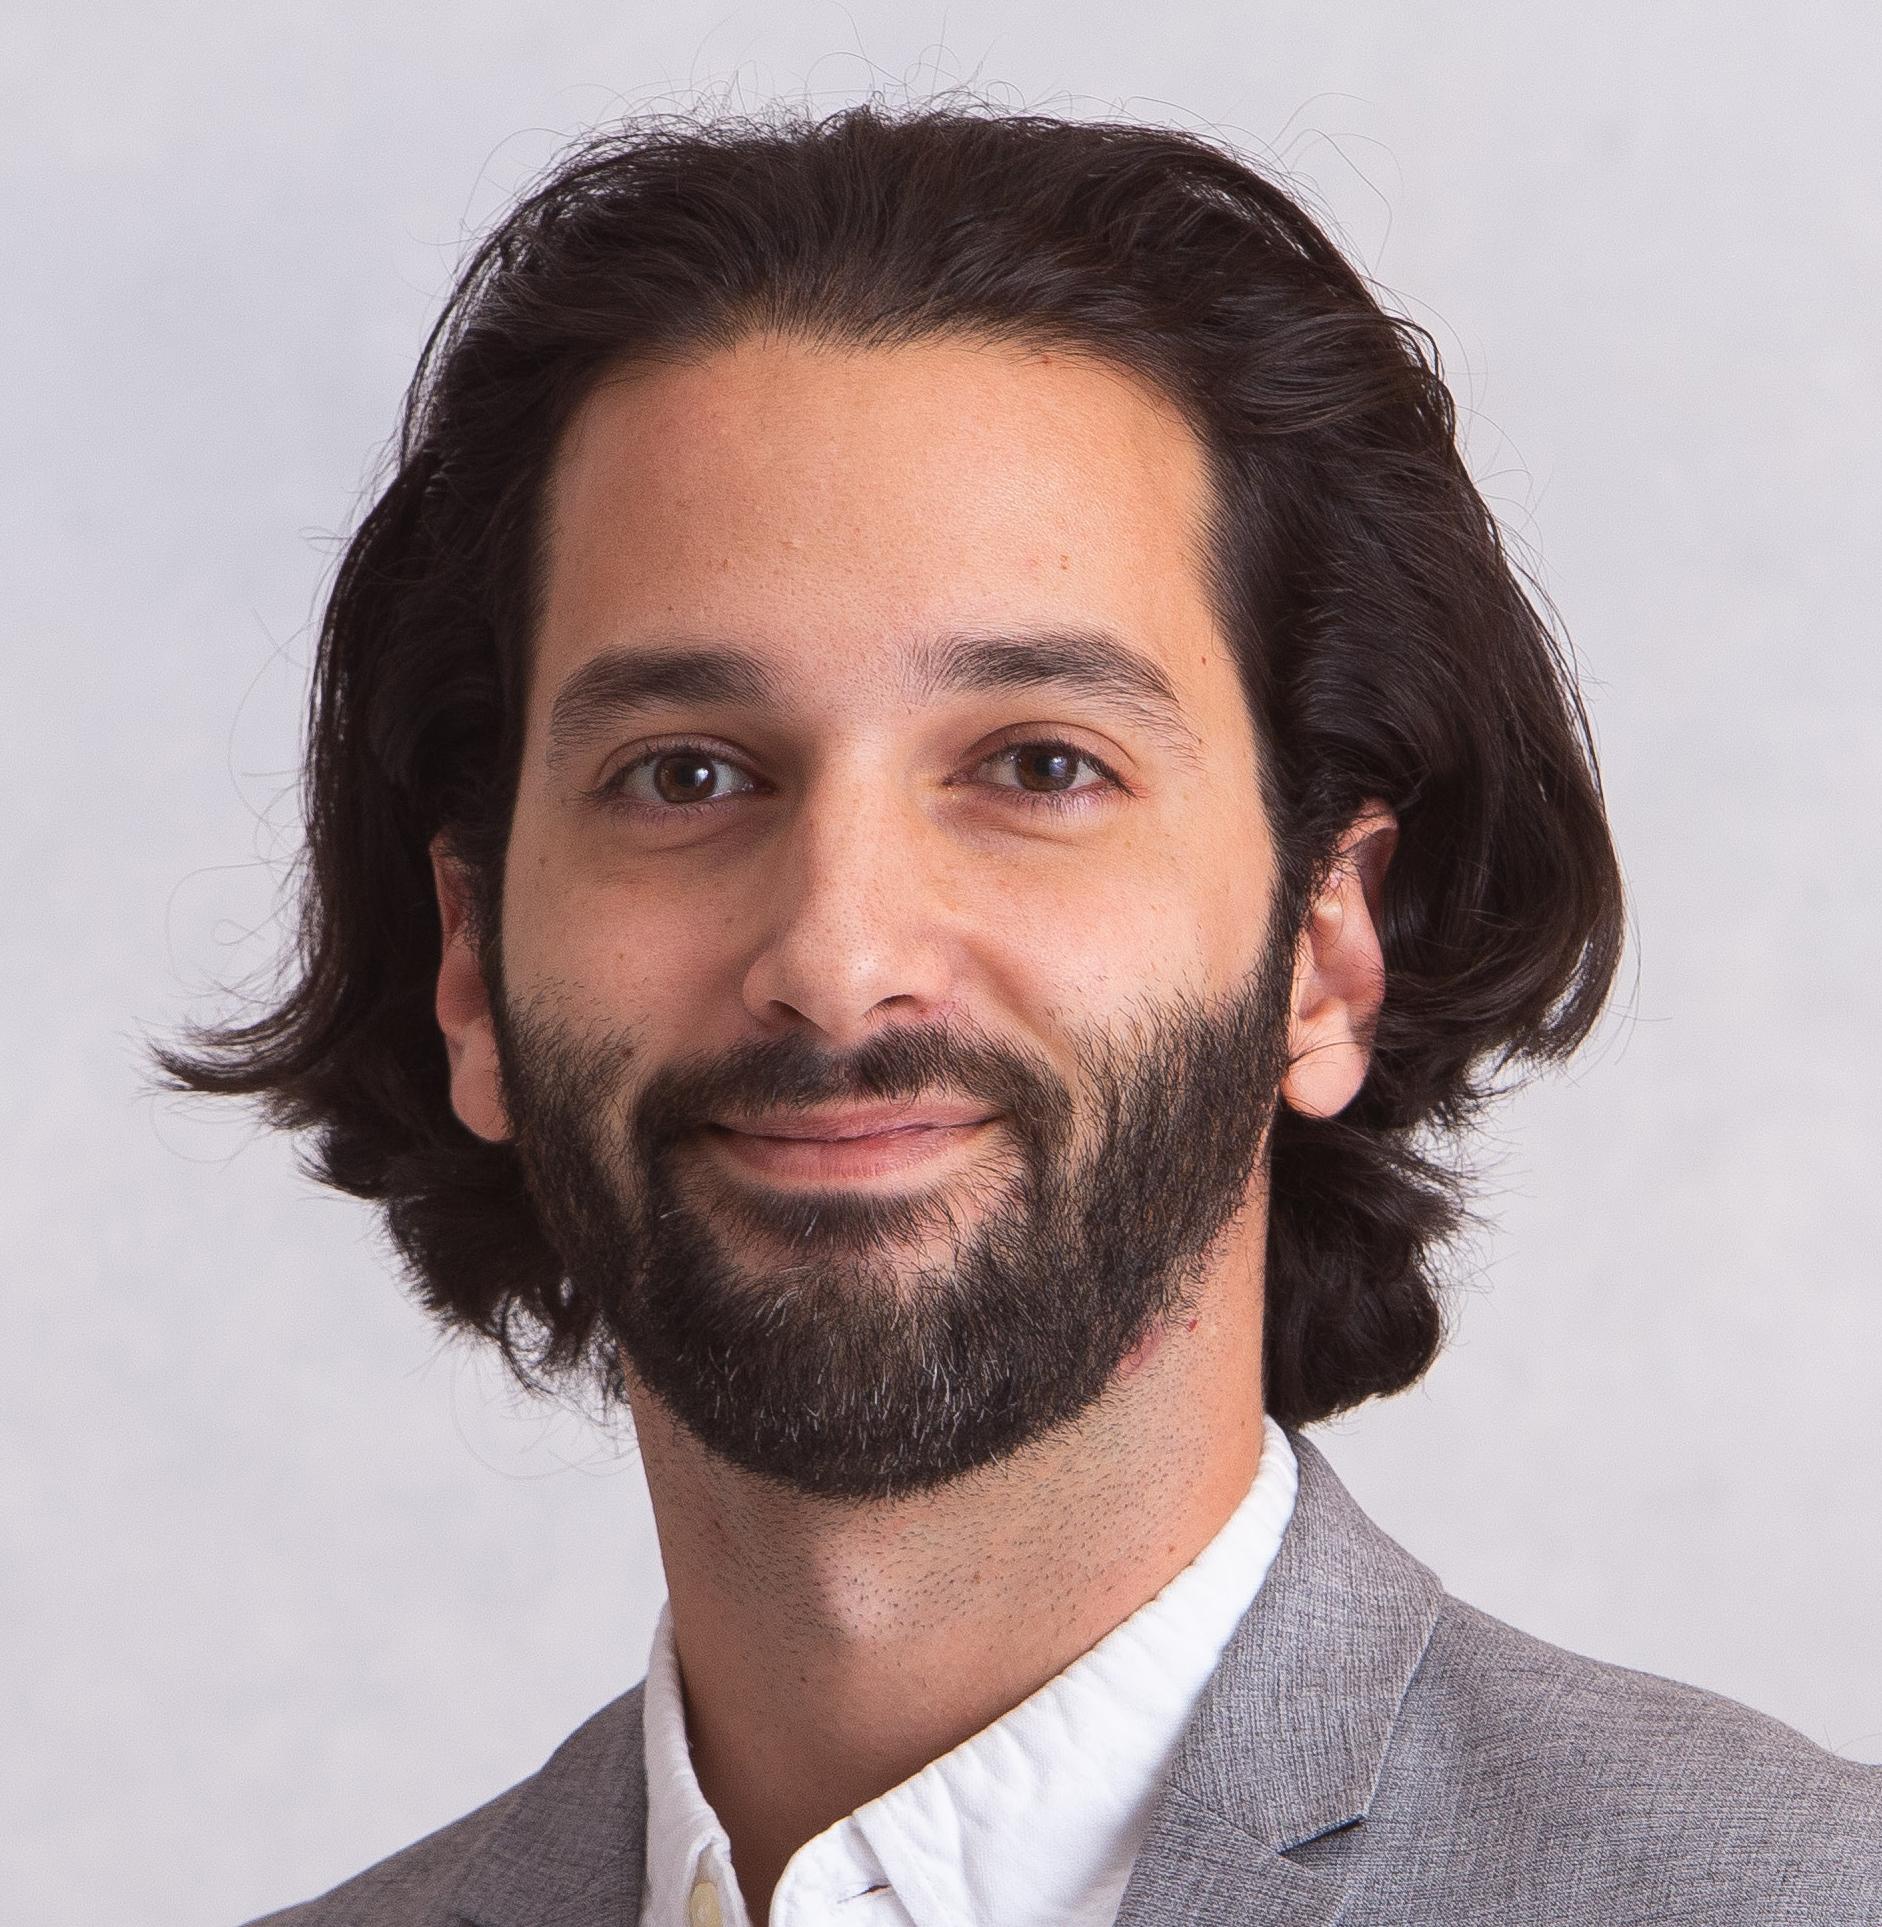 Danny Lafuente, Assistant Director, Berkley Center for Entrepreneurship.